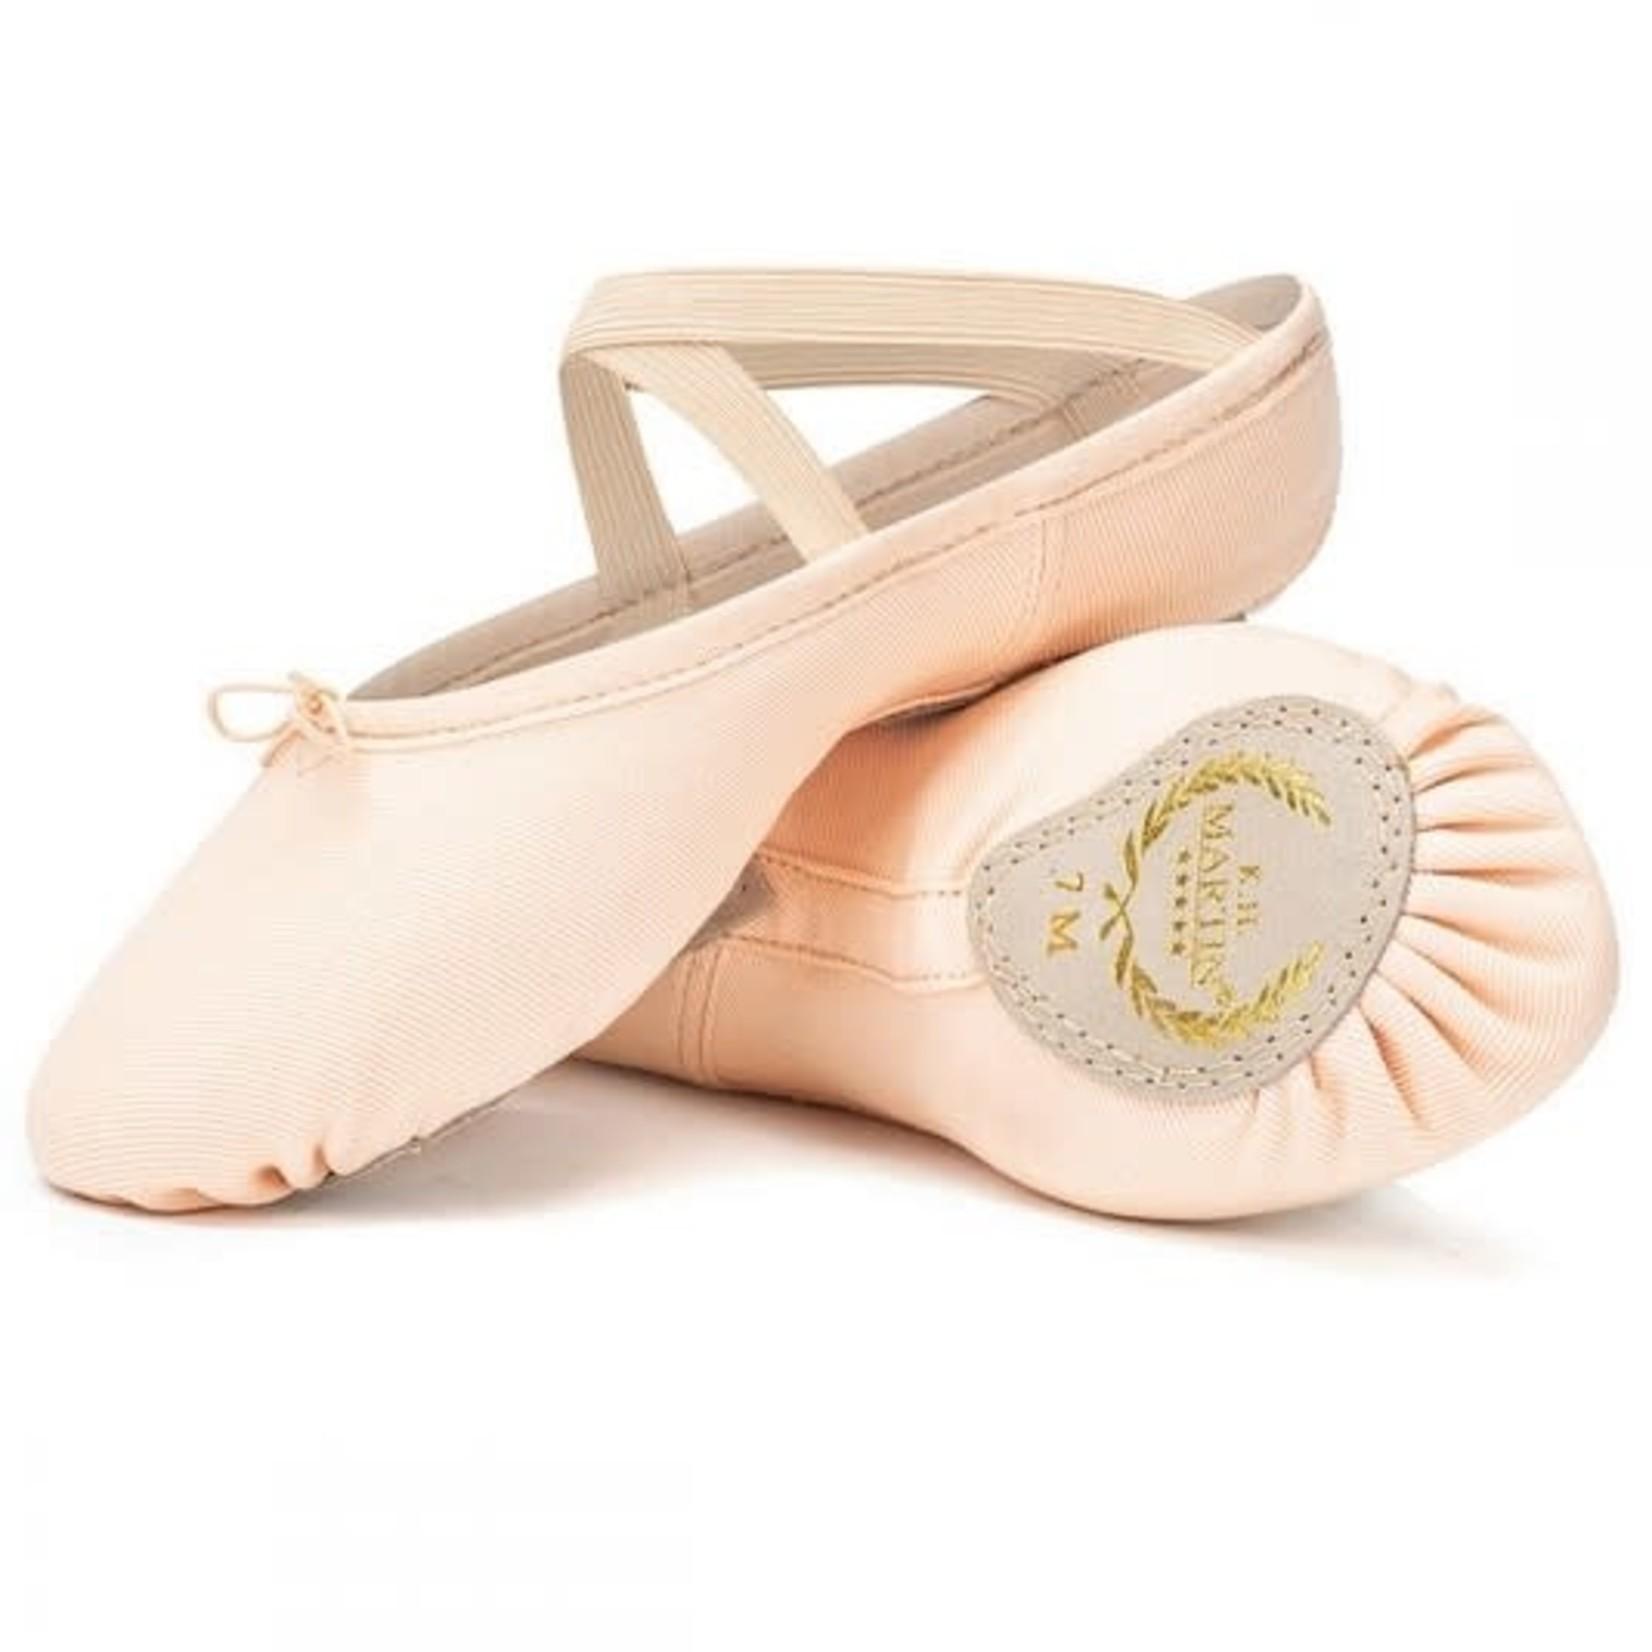 KH Martin KH Martin M001LC Low-cut Stretch Canvas Ballet Shoe